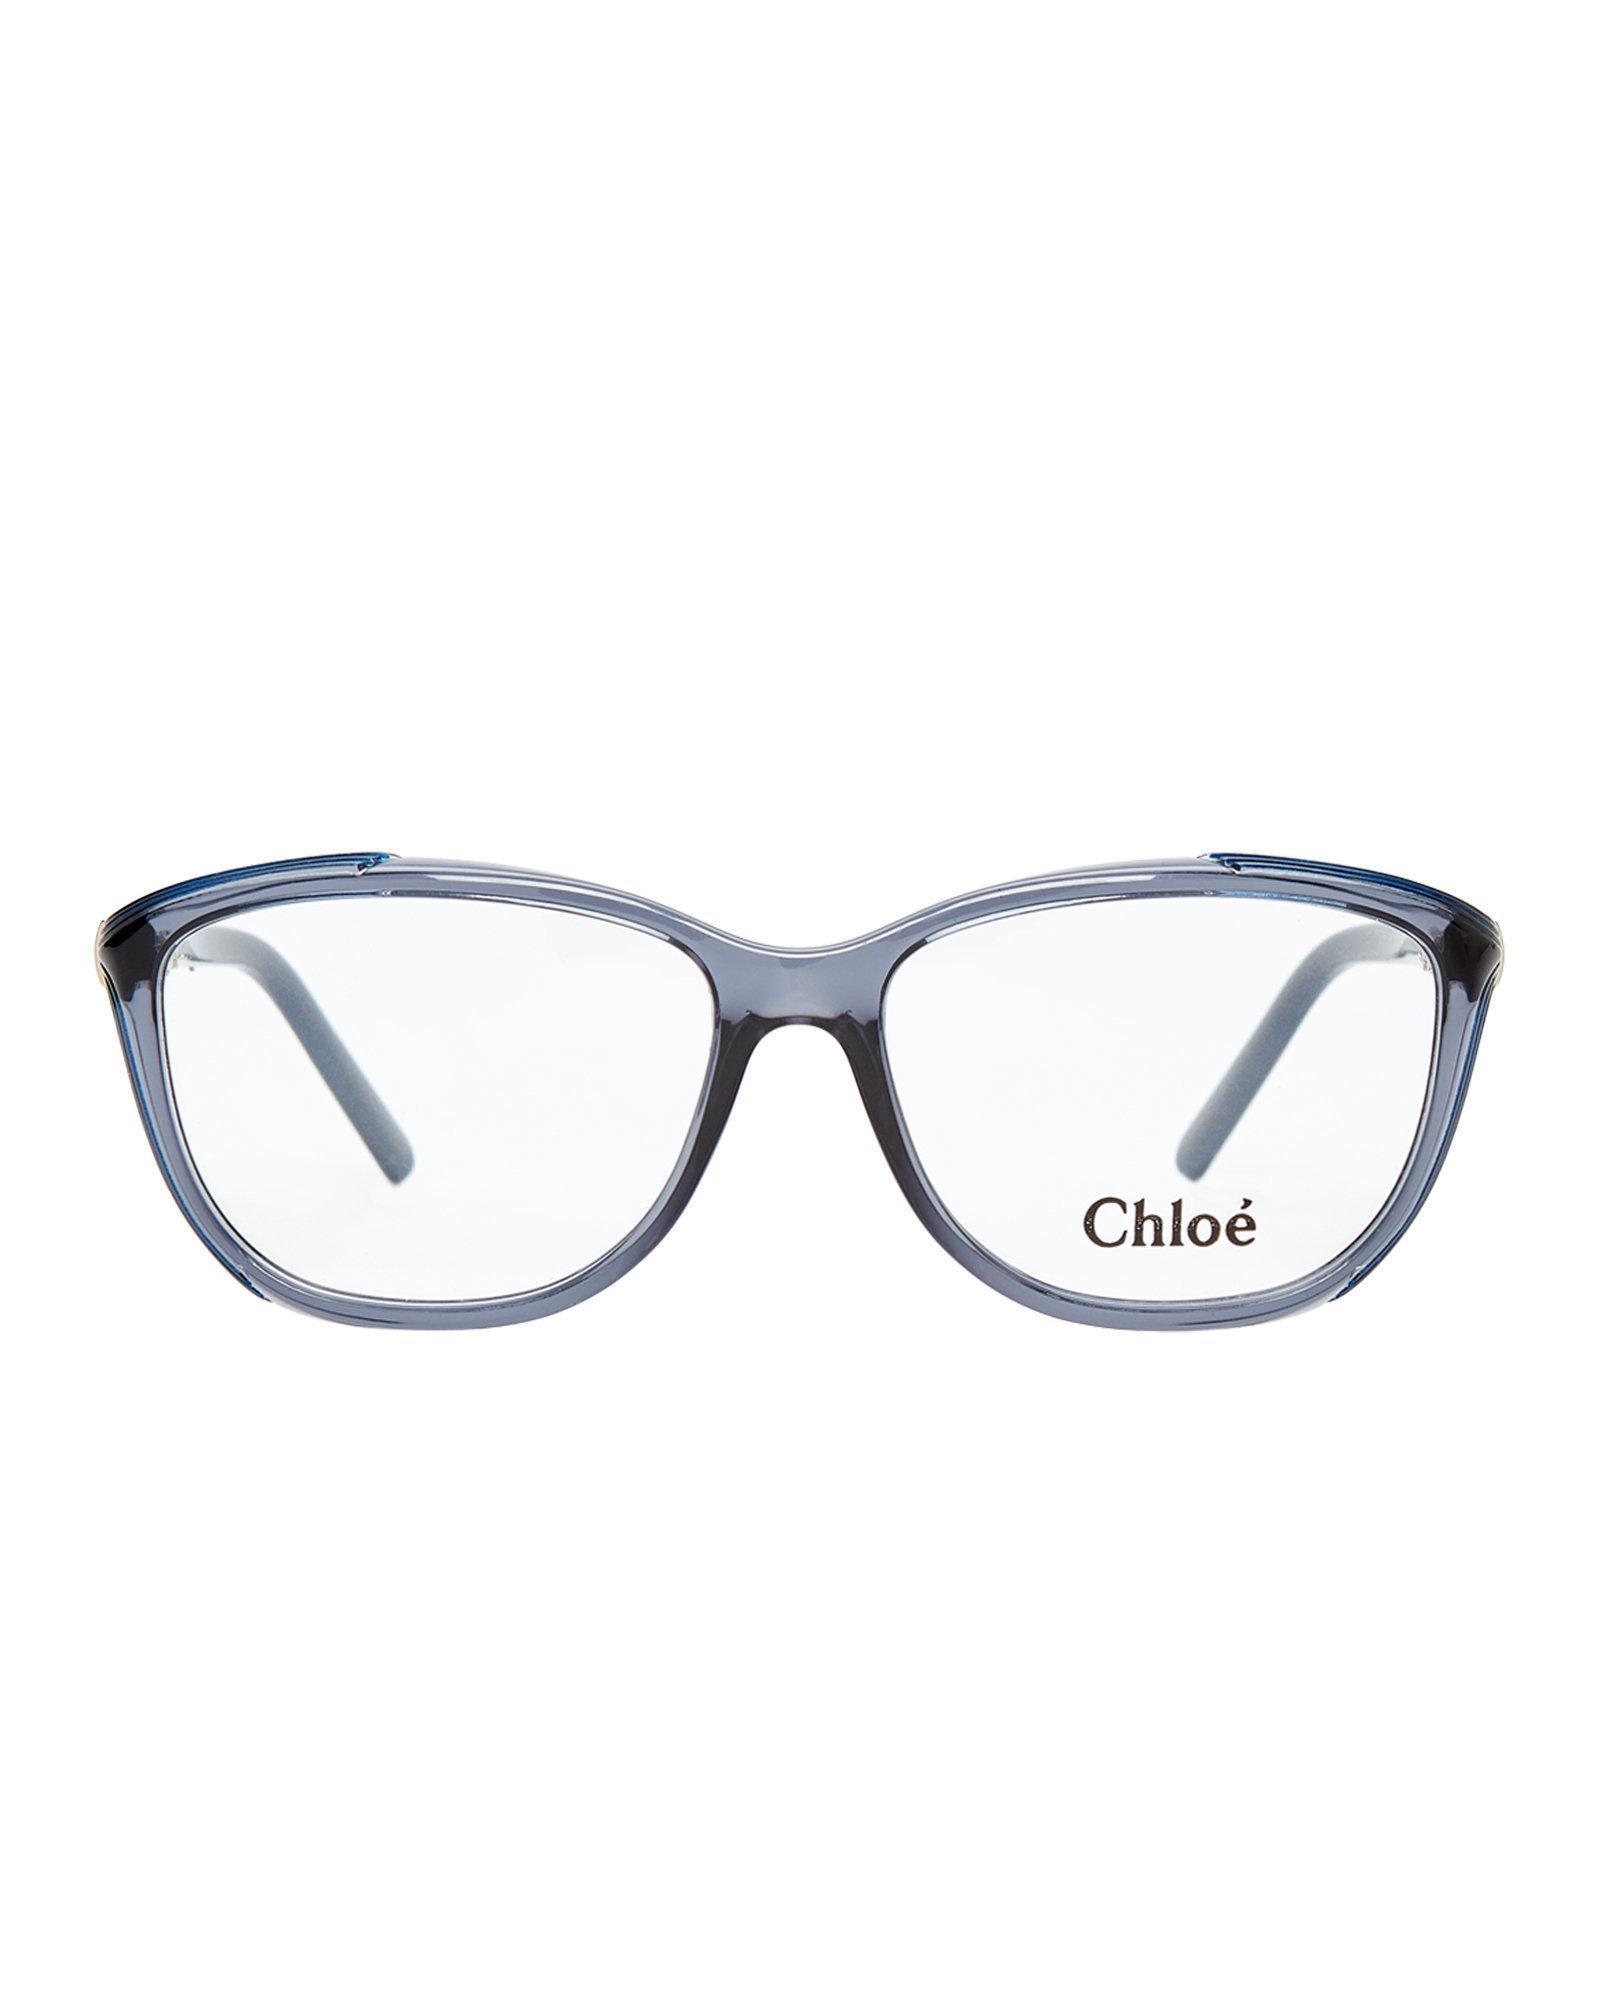 ab106e398d02 Lyst - Chloé Ce2648 Rectangular Optical Frames in Gray